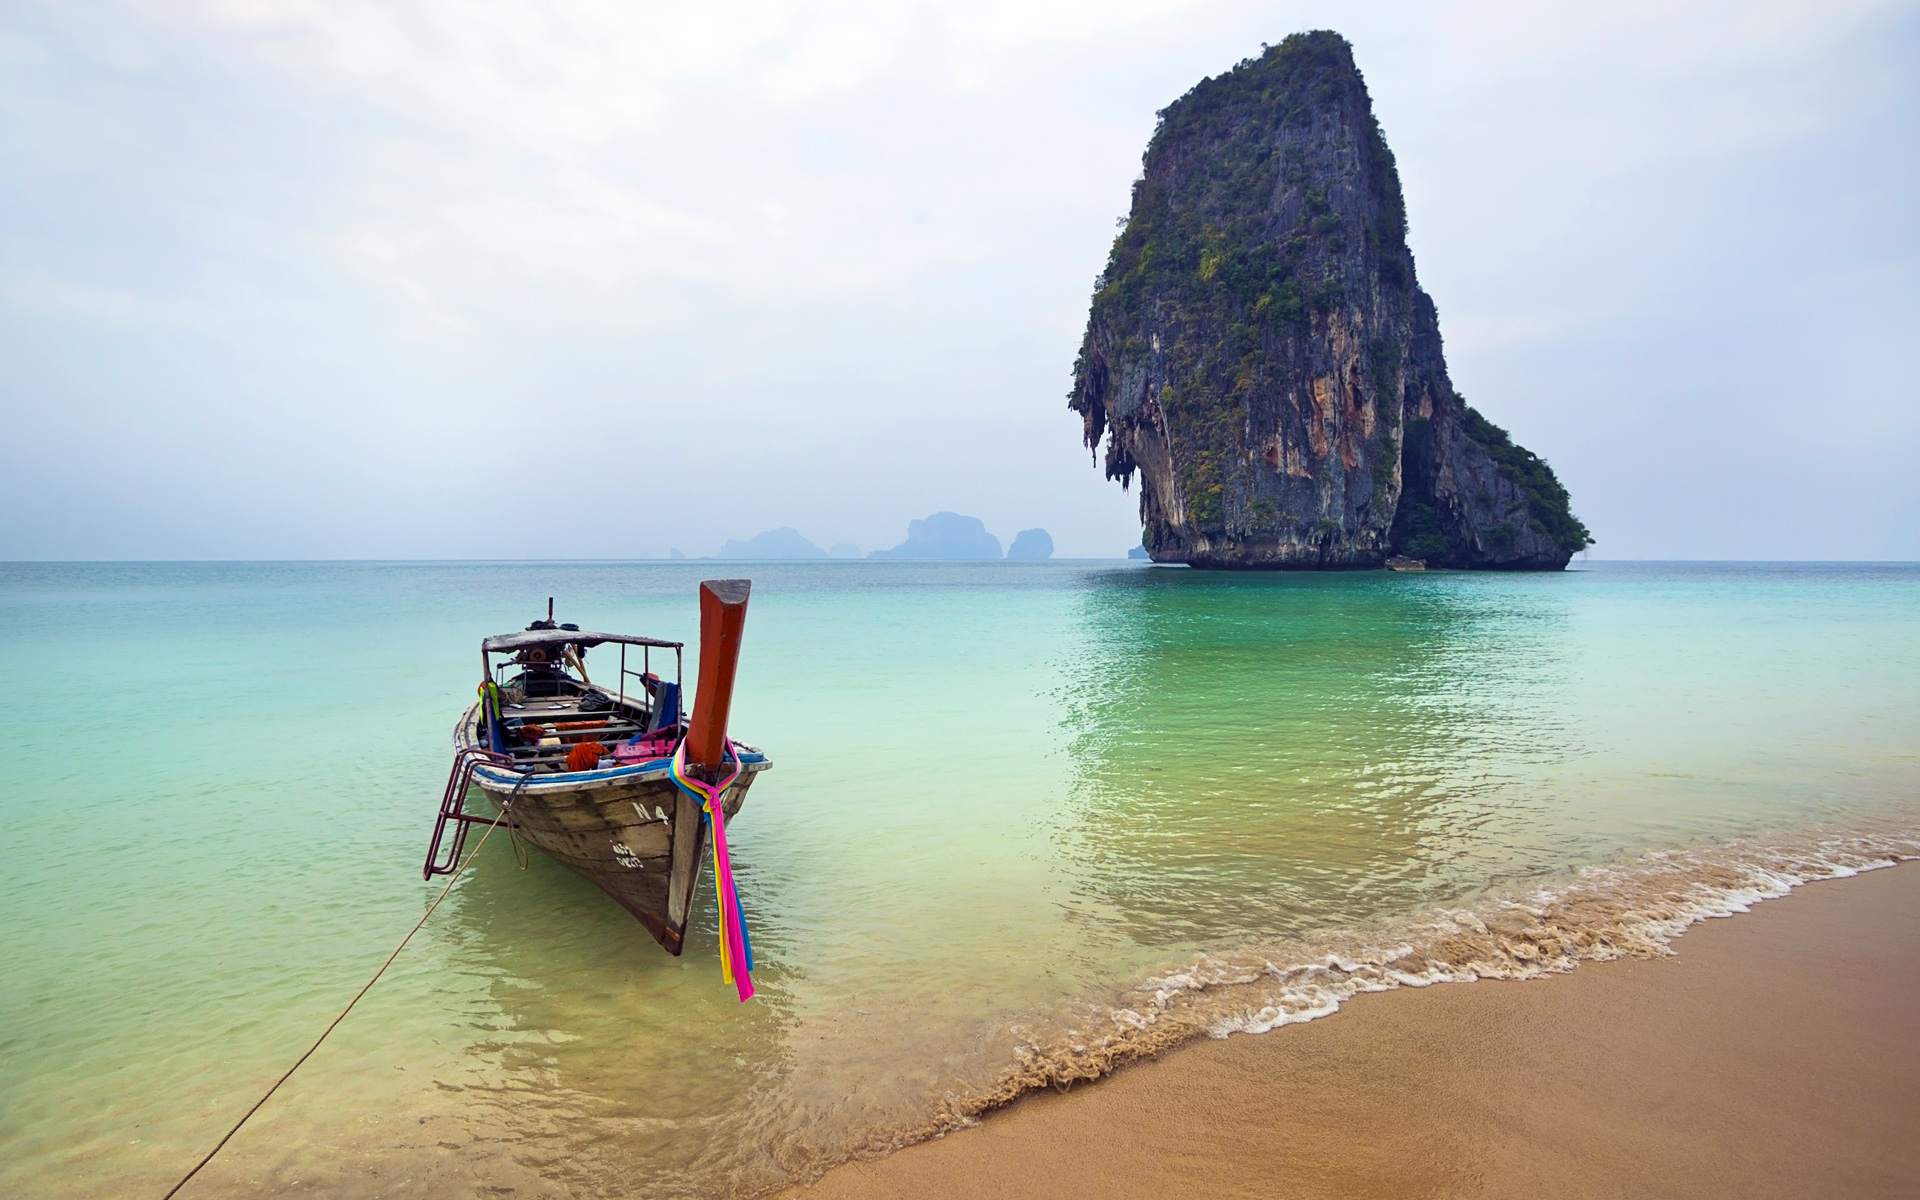 Railay Beach Thailand Wallpaper Wide Desktop s1j1wzj7   Yoanucom 1920x1200